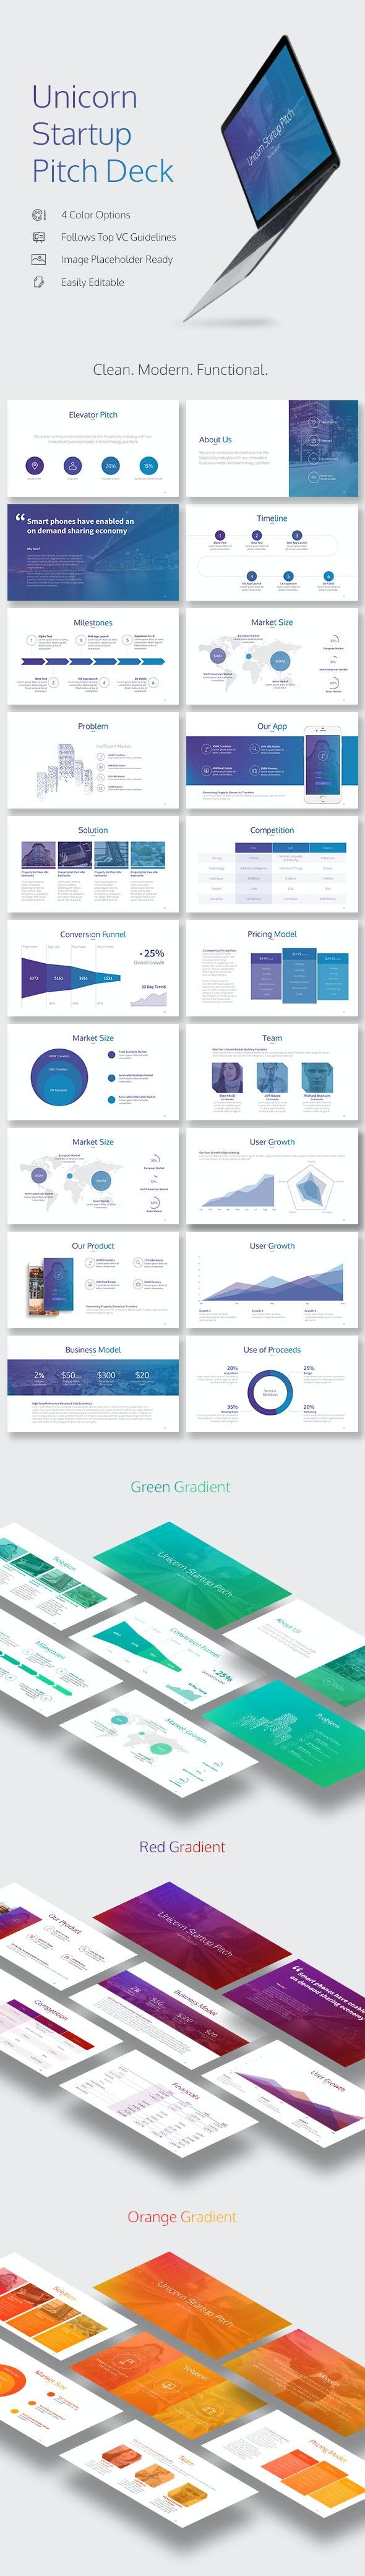 Unicorn Startup Pitch Deck - Pitch Deck PowerPoint Templates